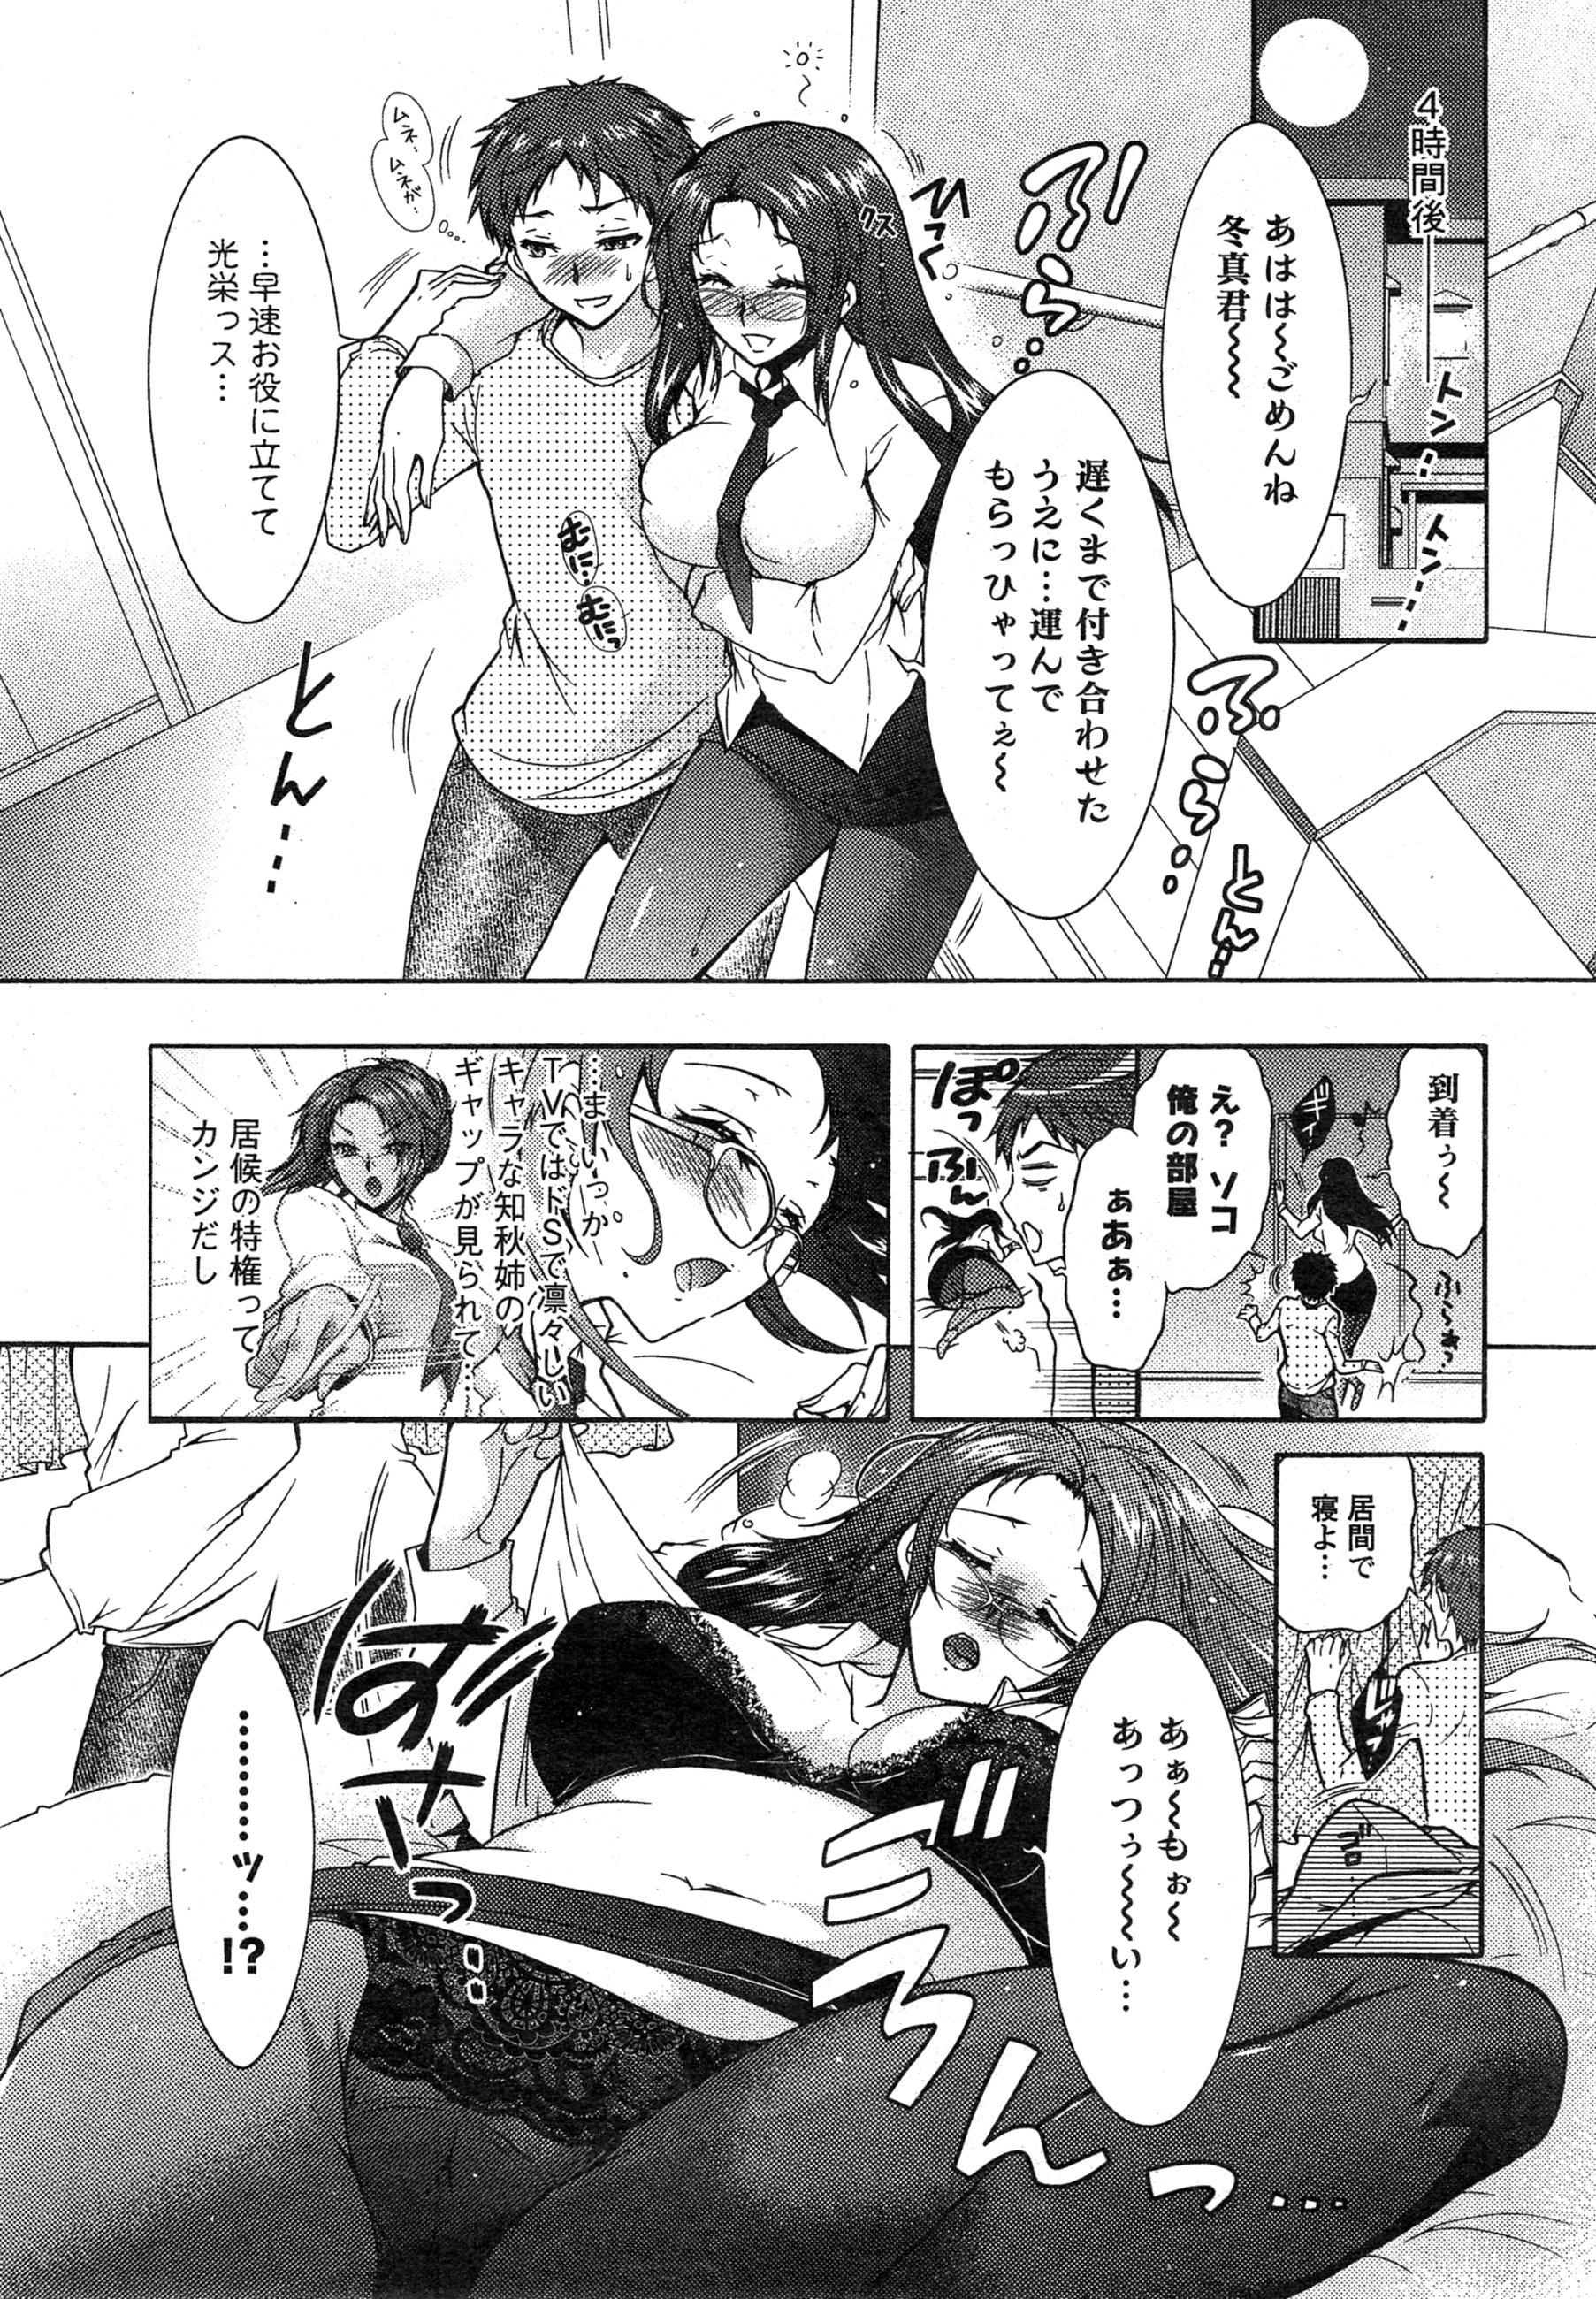 [Honda Arima] Sanshimai no Omocha - The Slave of Three Sisters Ch. 1-6 9